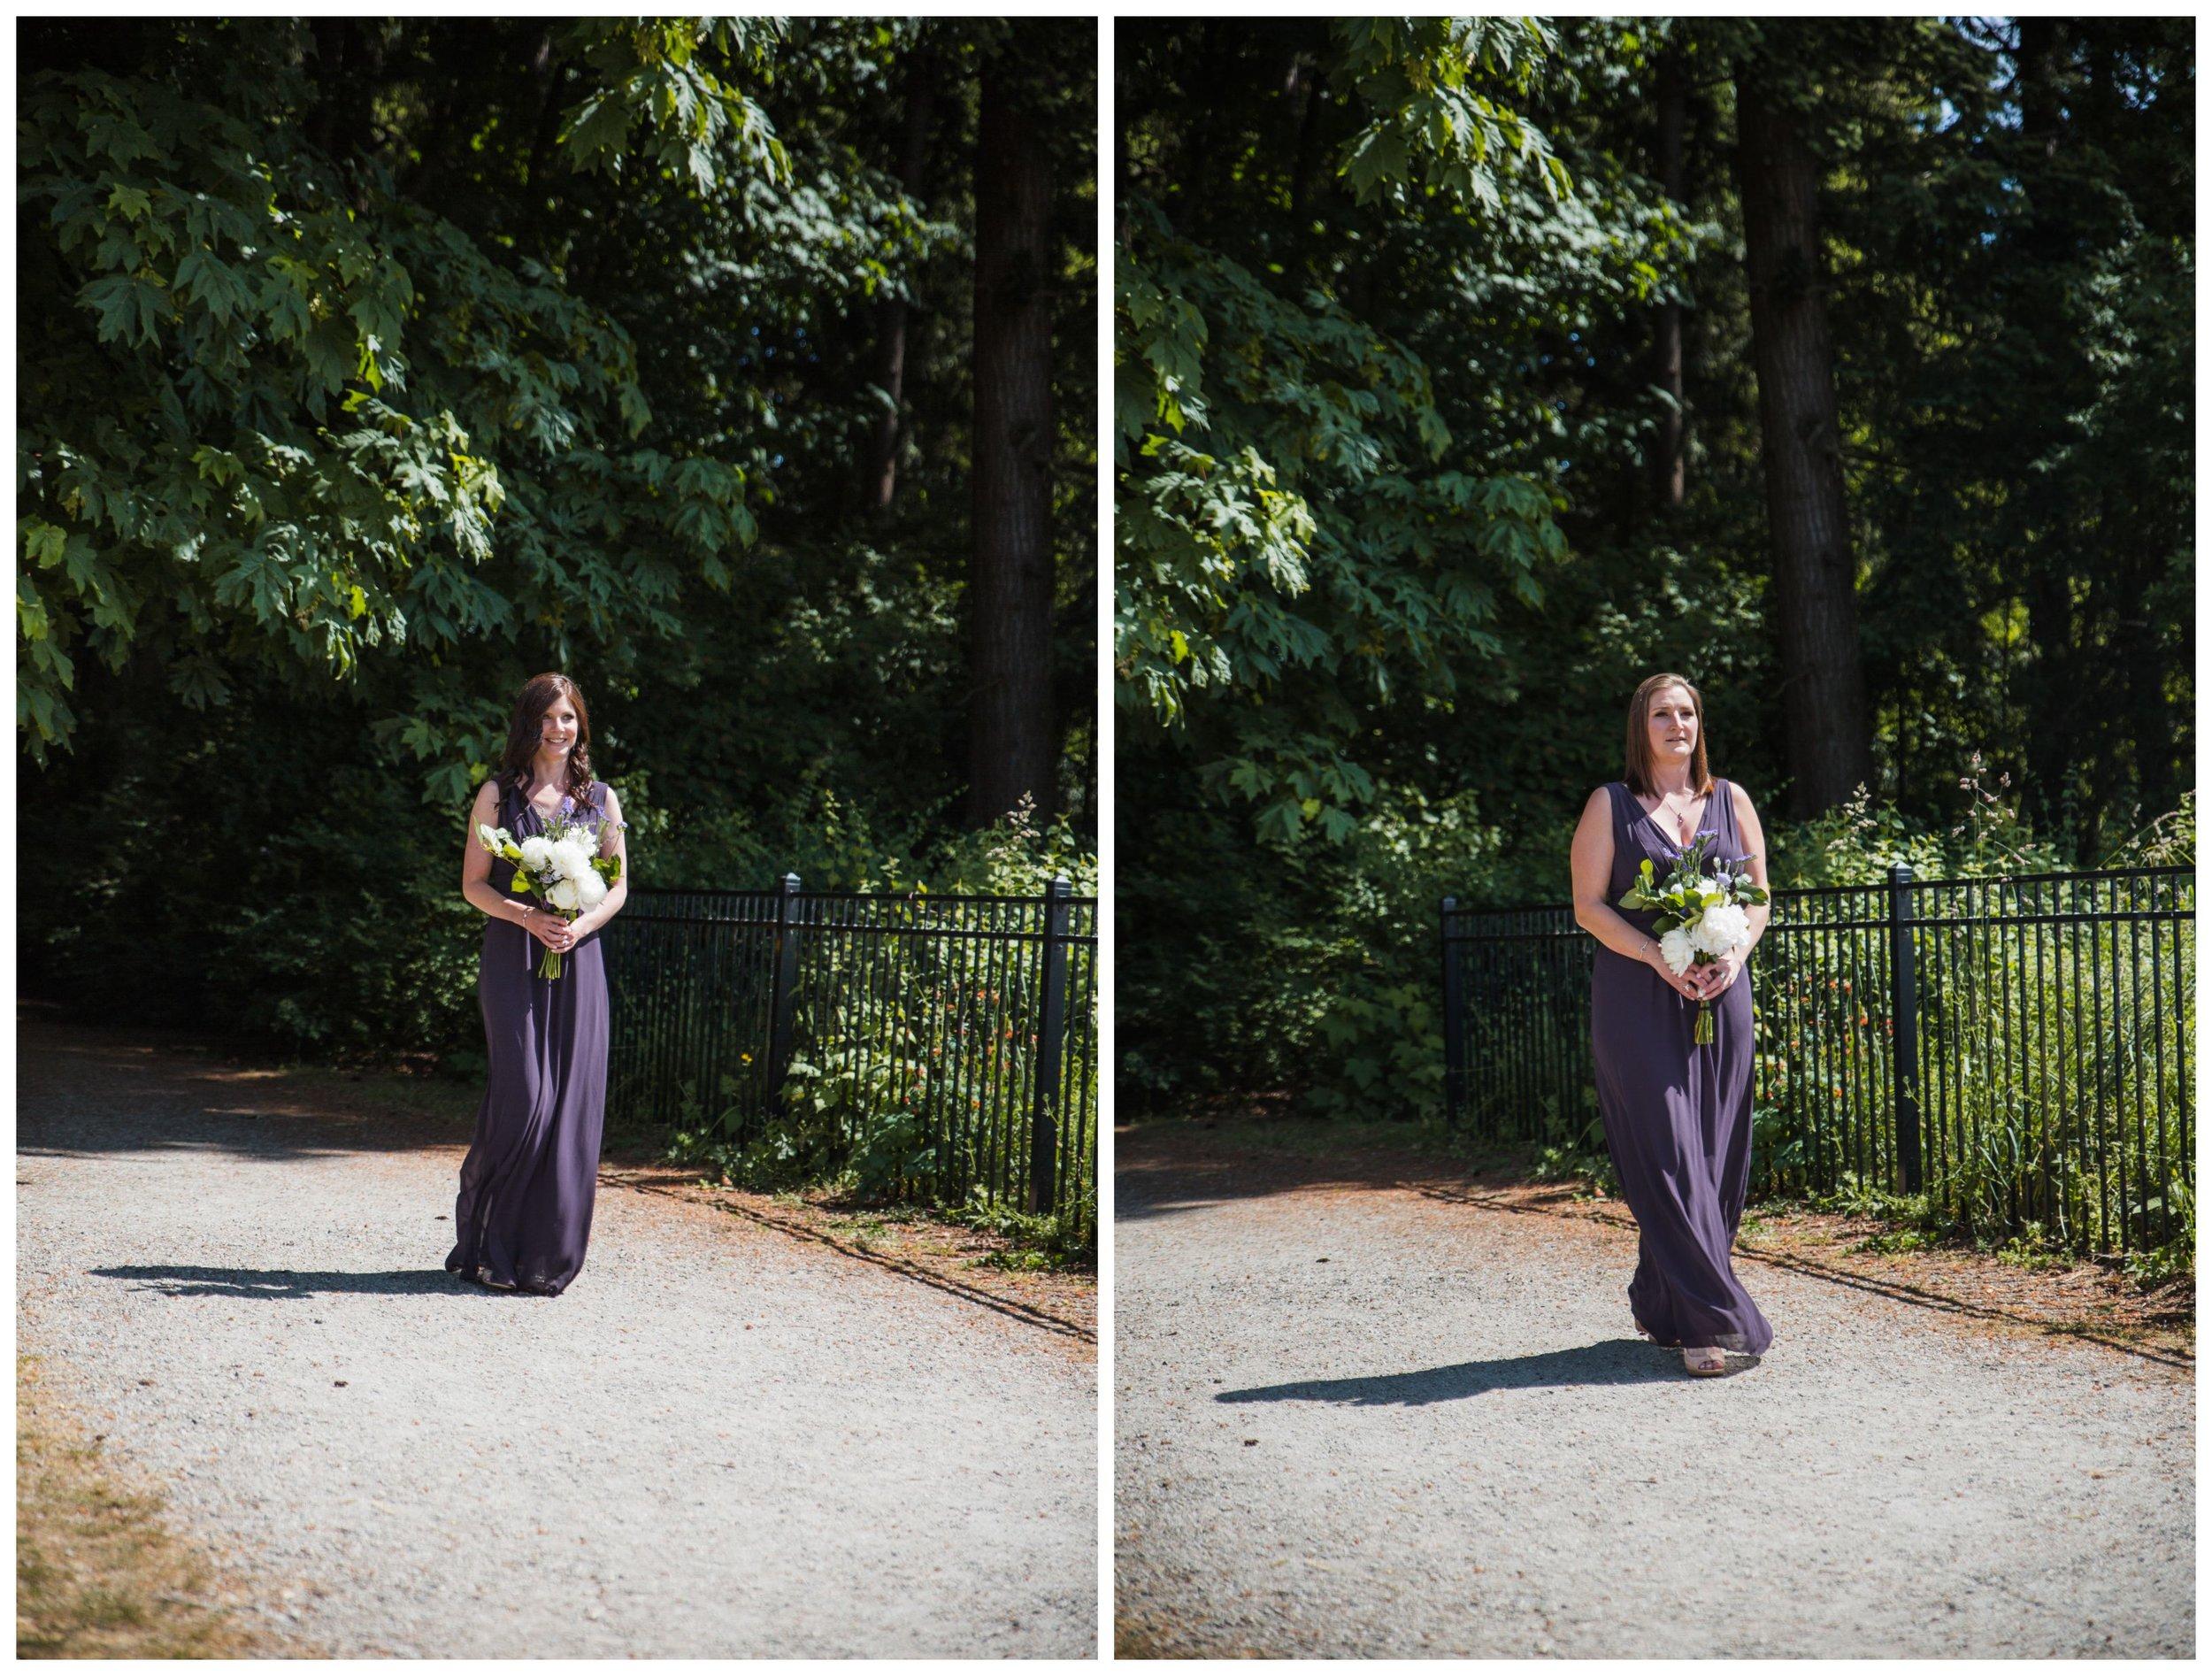 kwomais point park wedding ceremony.jpg